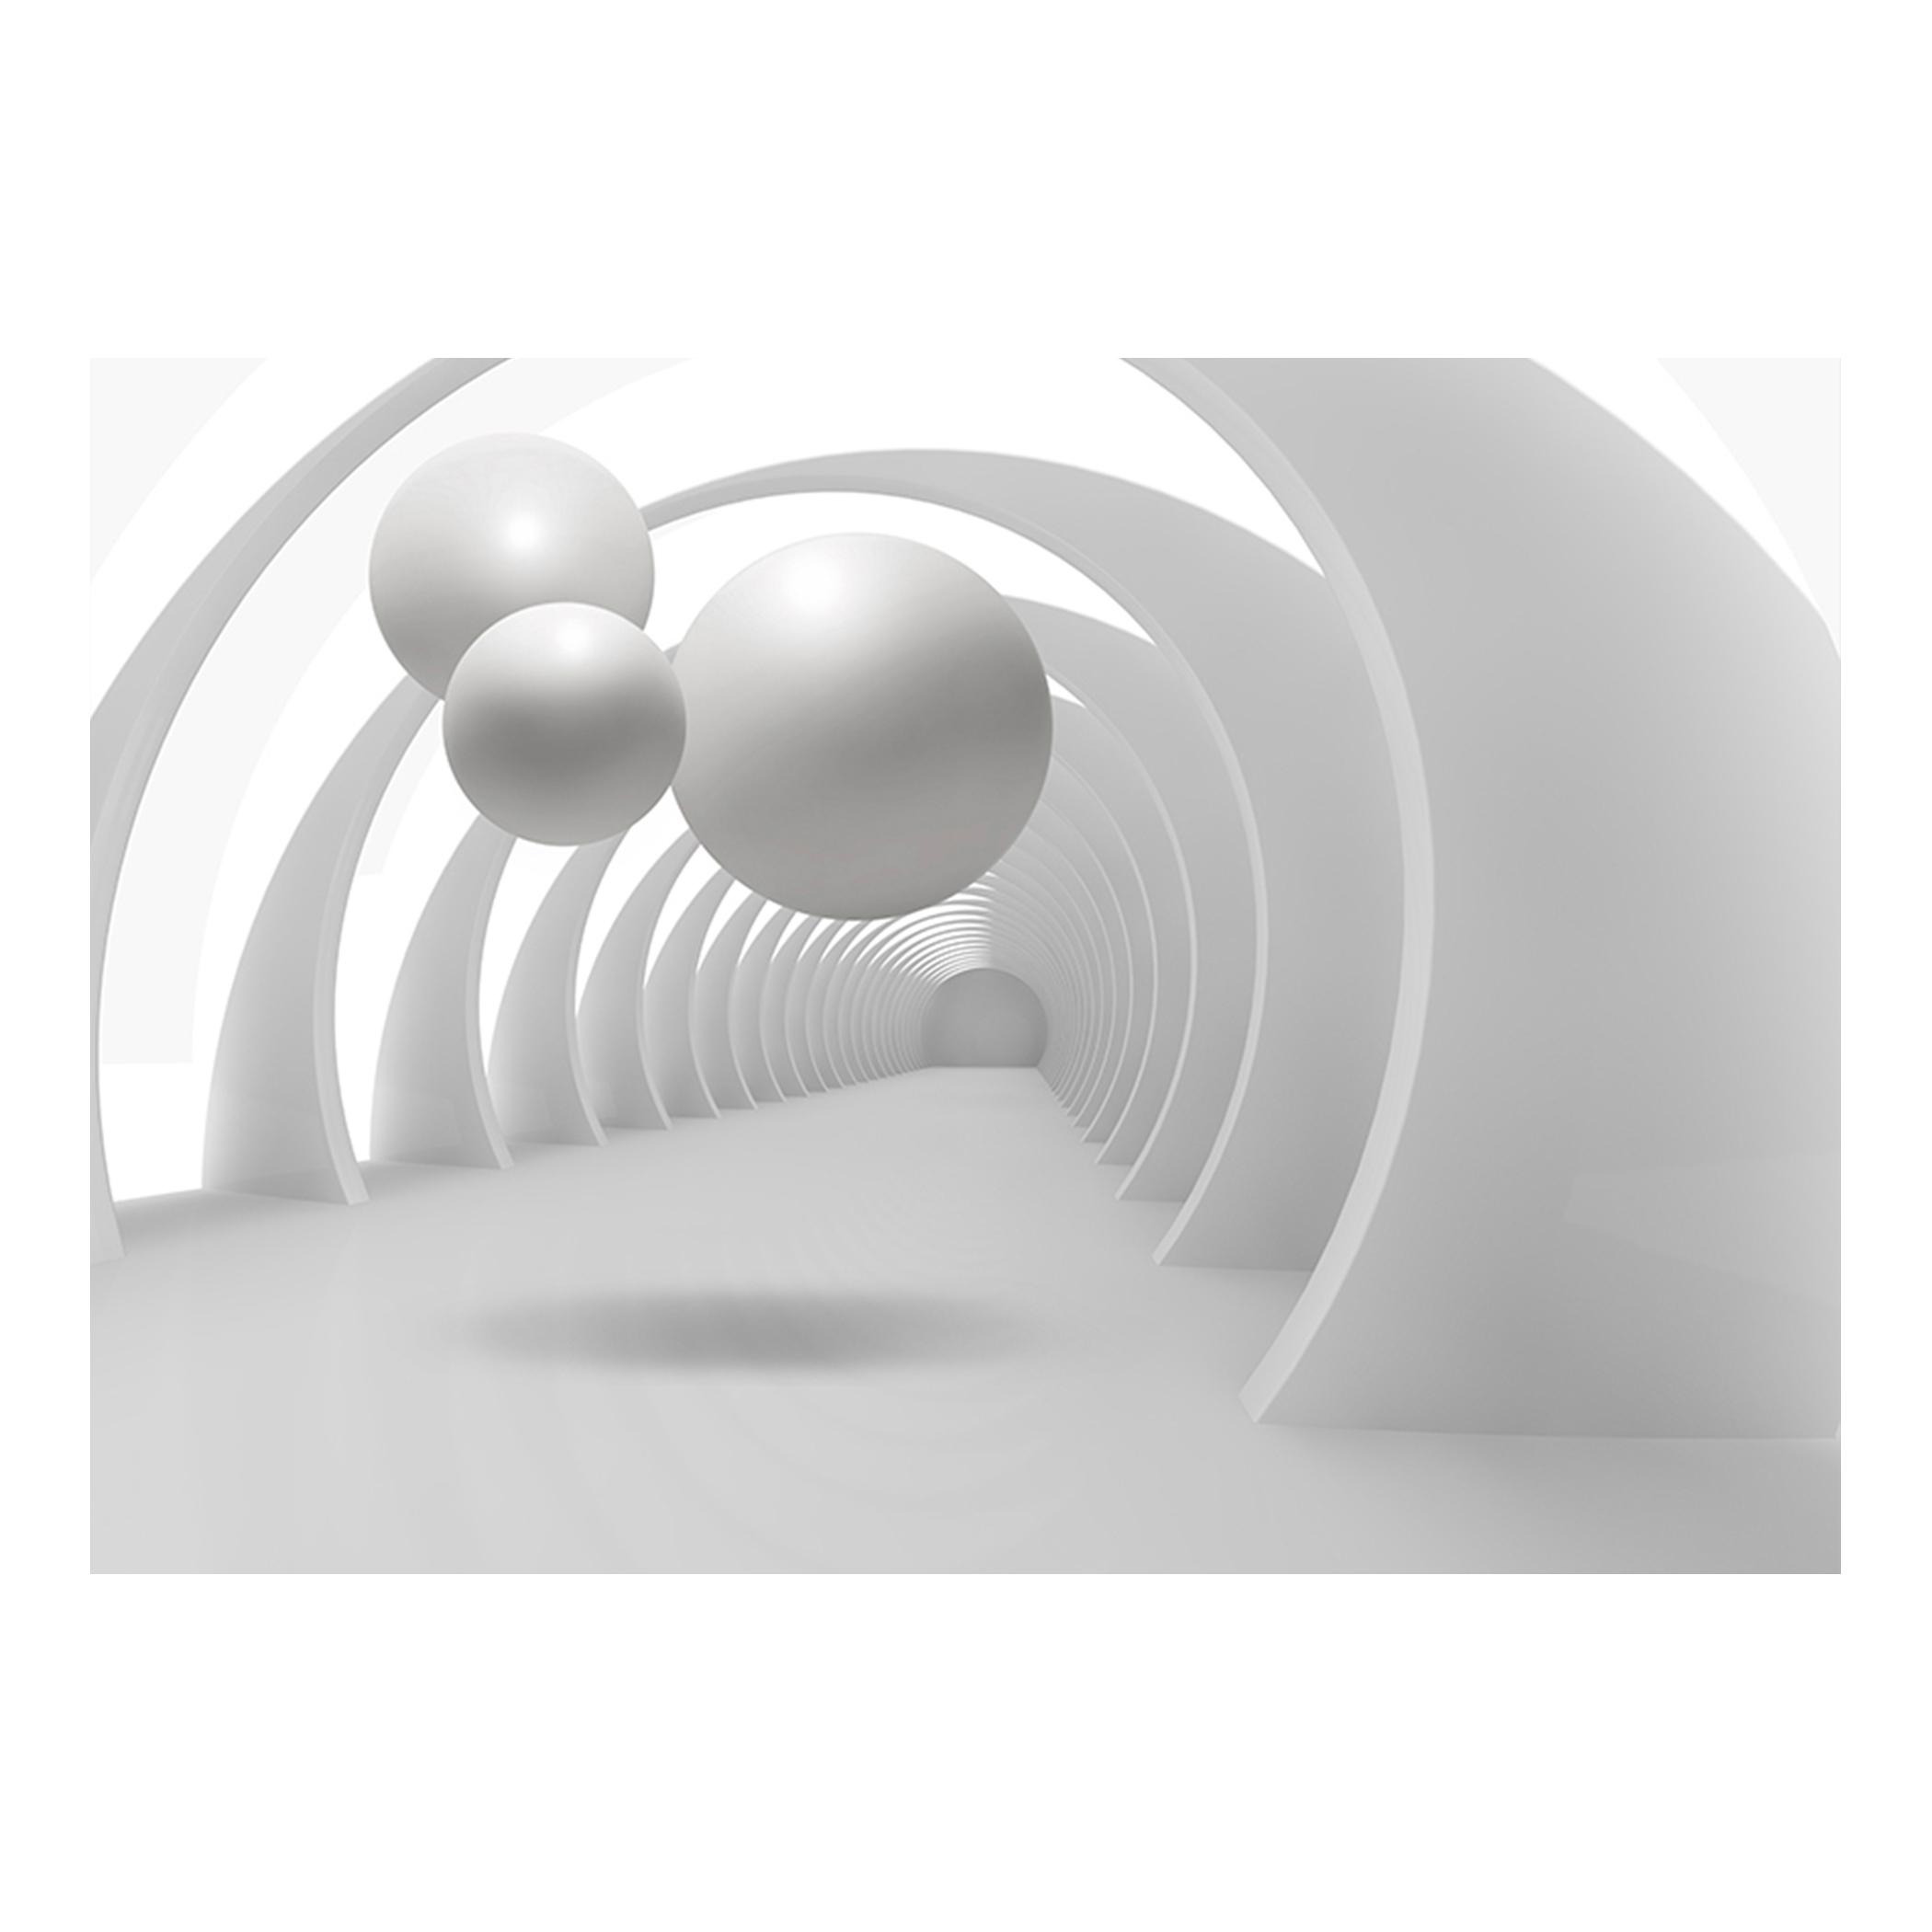 vlies fototapete 3d kugeln weiß tunnel tapete tapeten schlafzimmer ... - Tapeten Für Schlafzimmer